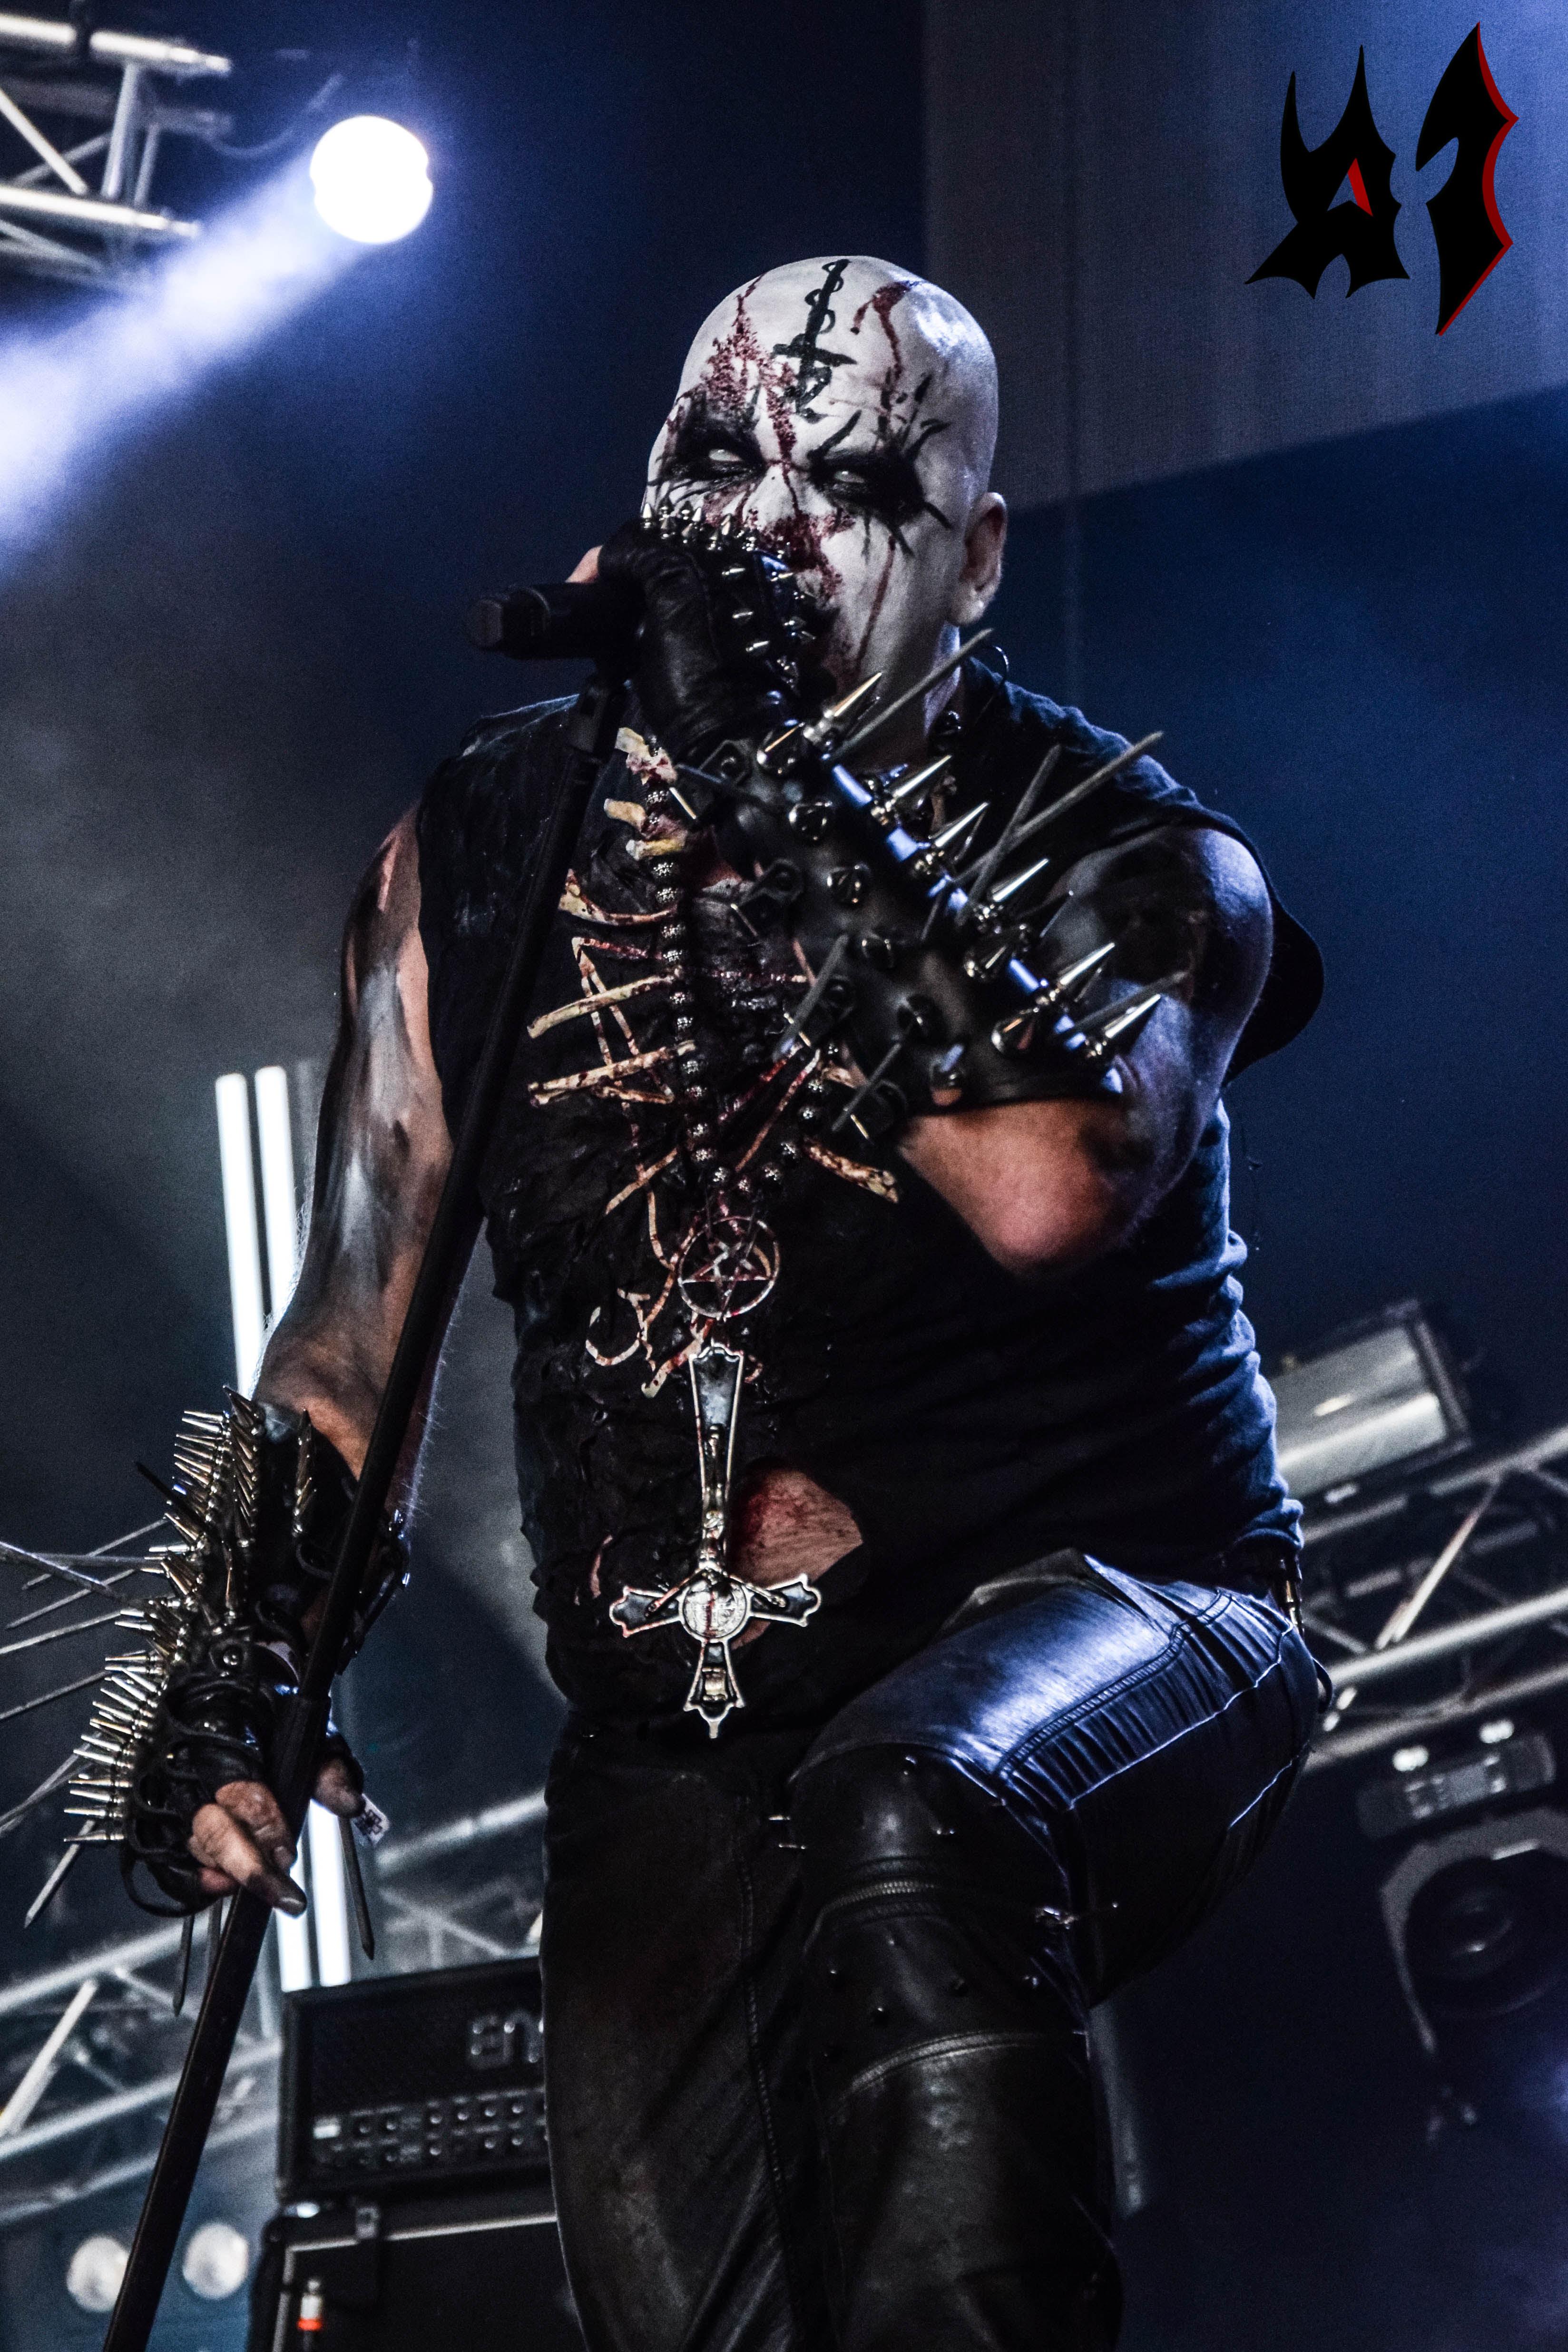 Hellfest - Day 1 - Nordjevel 6